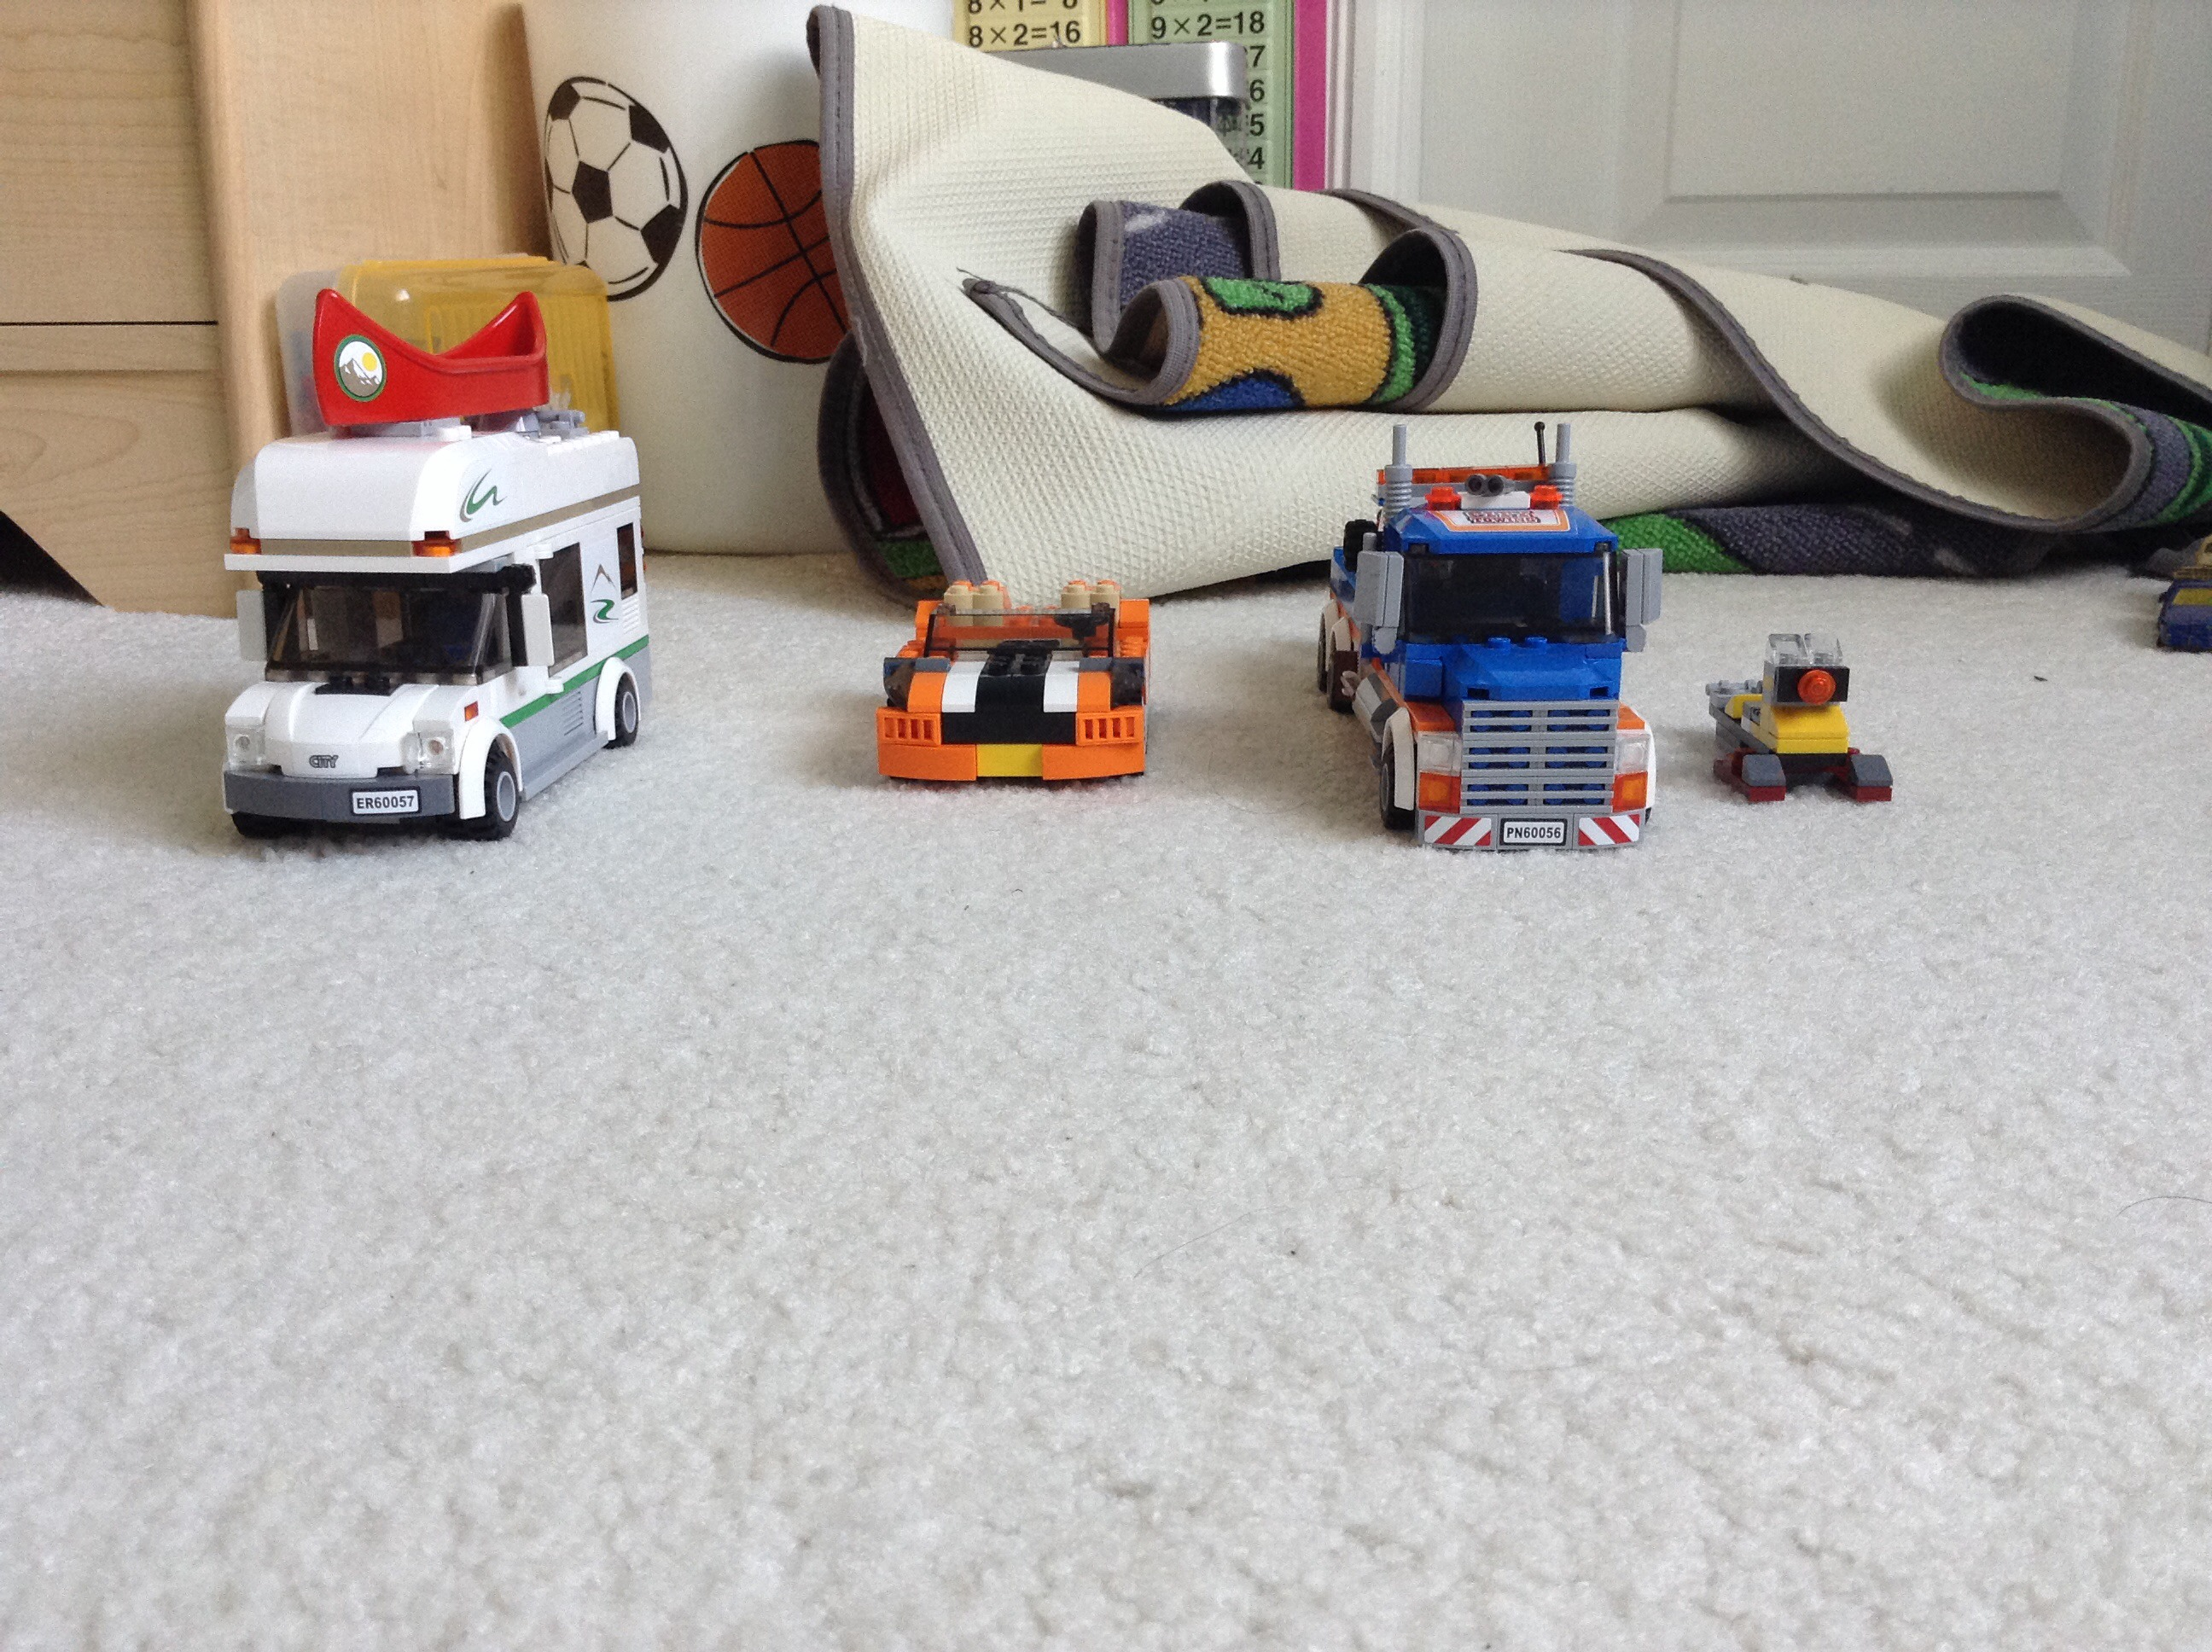 My Legos!